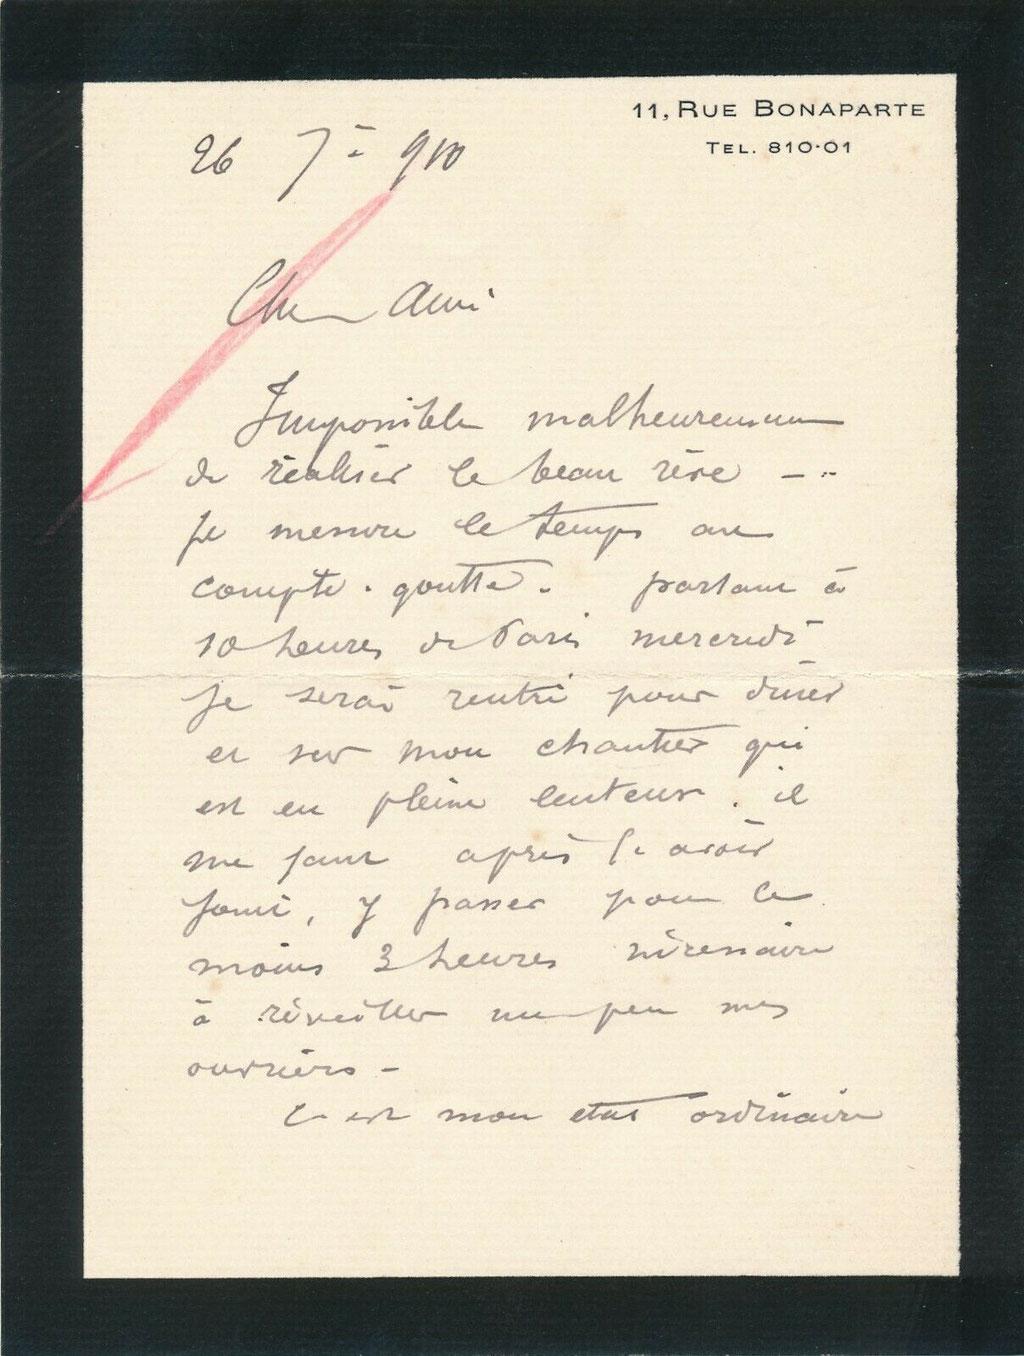 Charles Genuys lettre autographe signée